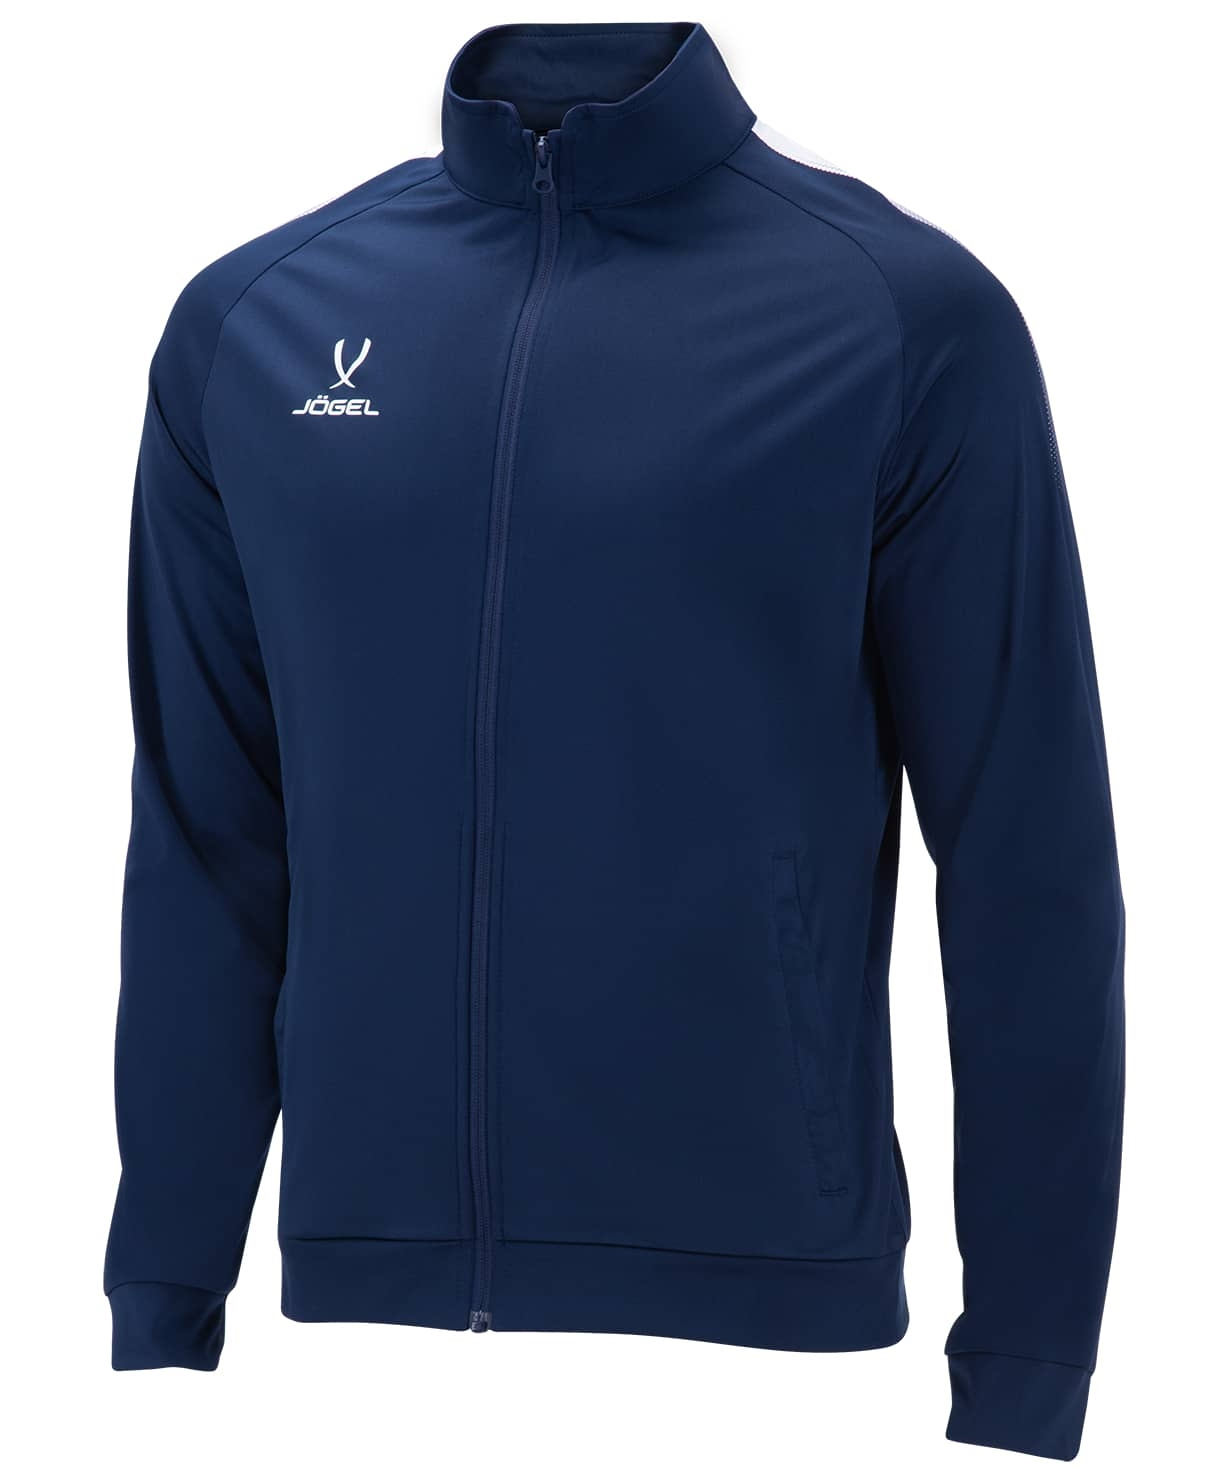 Олимпийка детская CAMP Training Jacket FZ, темно-синий